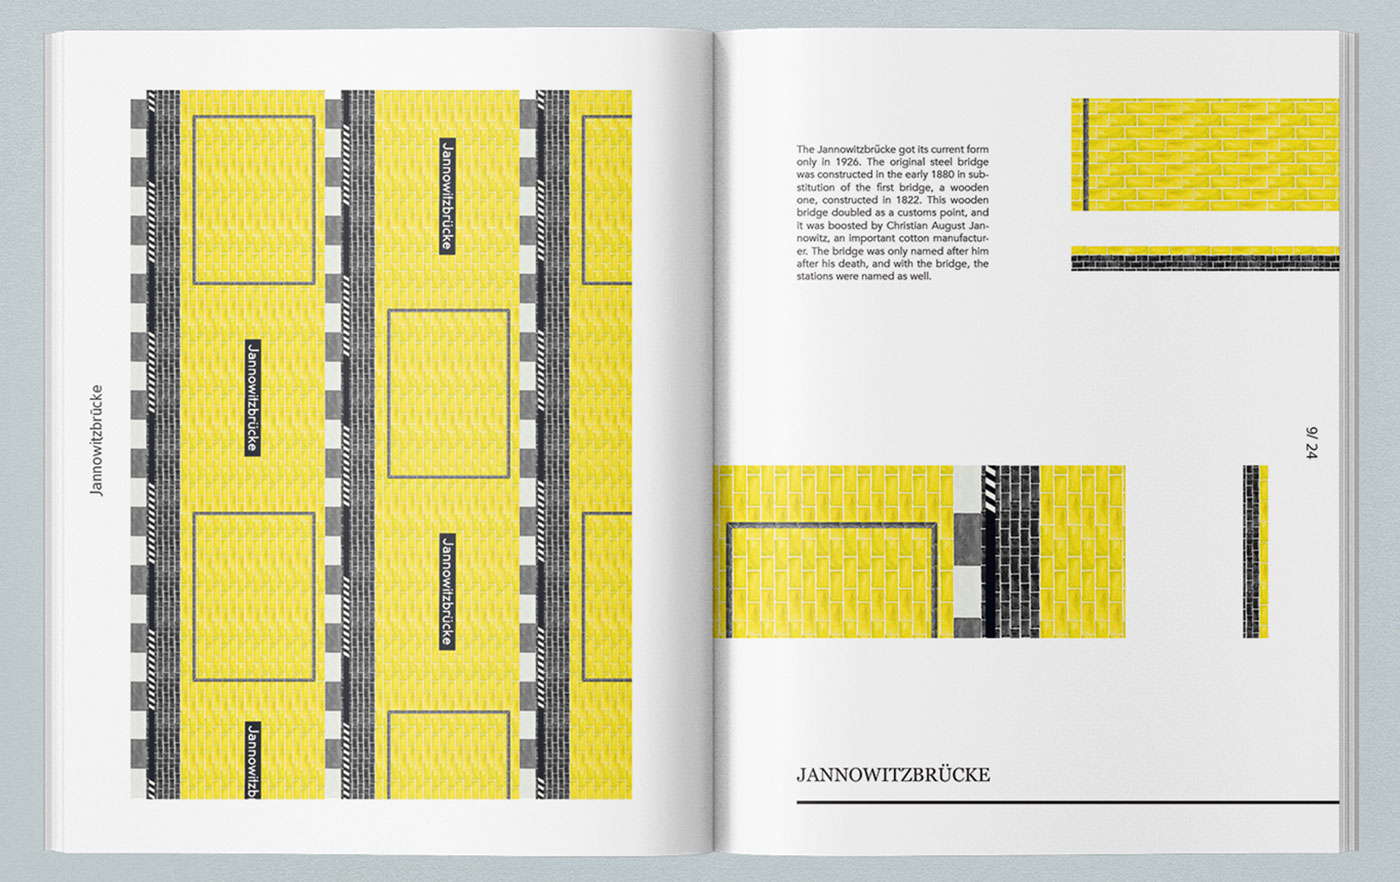 magazine_insides_pages-mockup-6.jpg